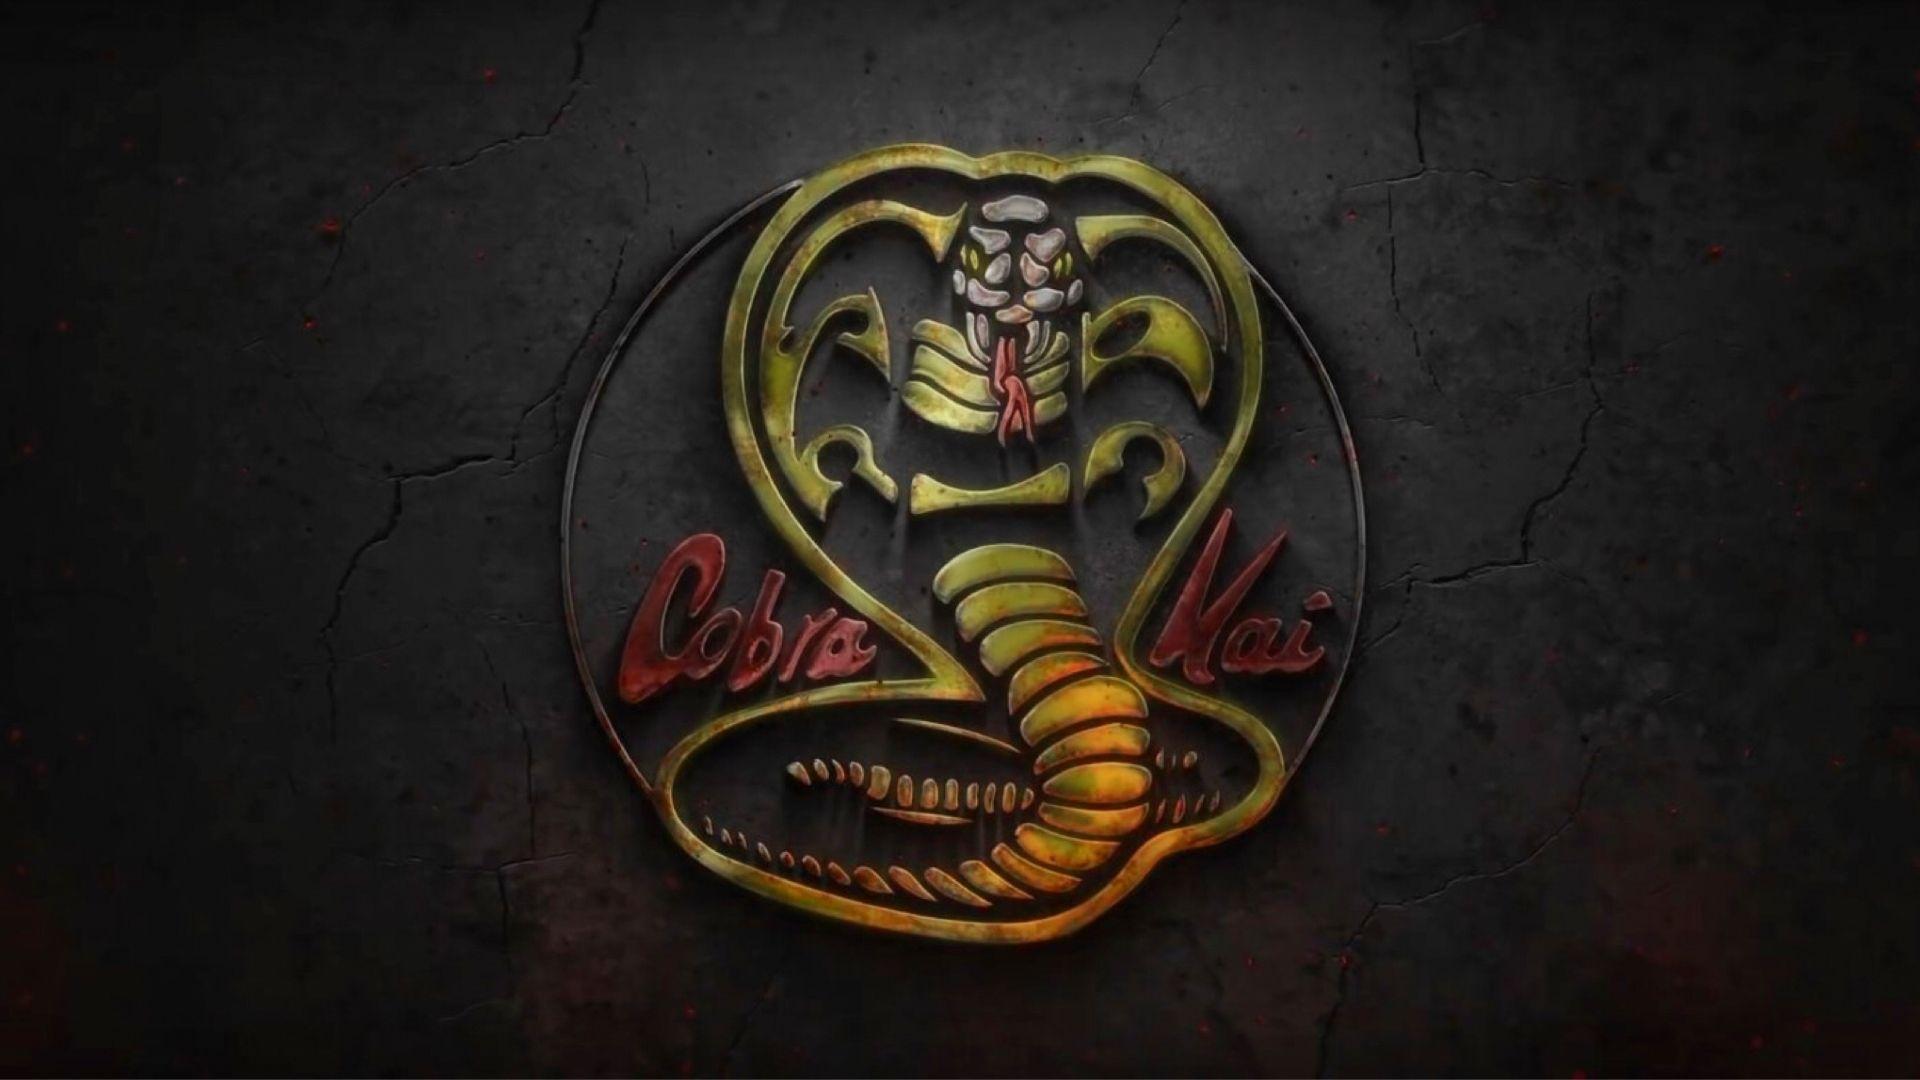 cobra kai wallpaper 4k